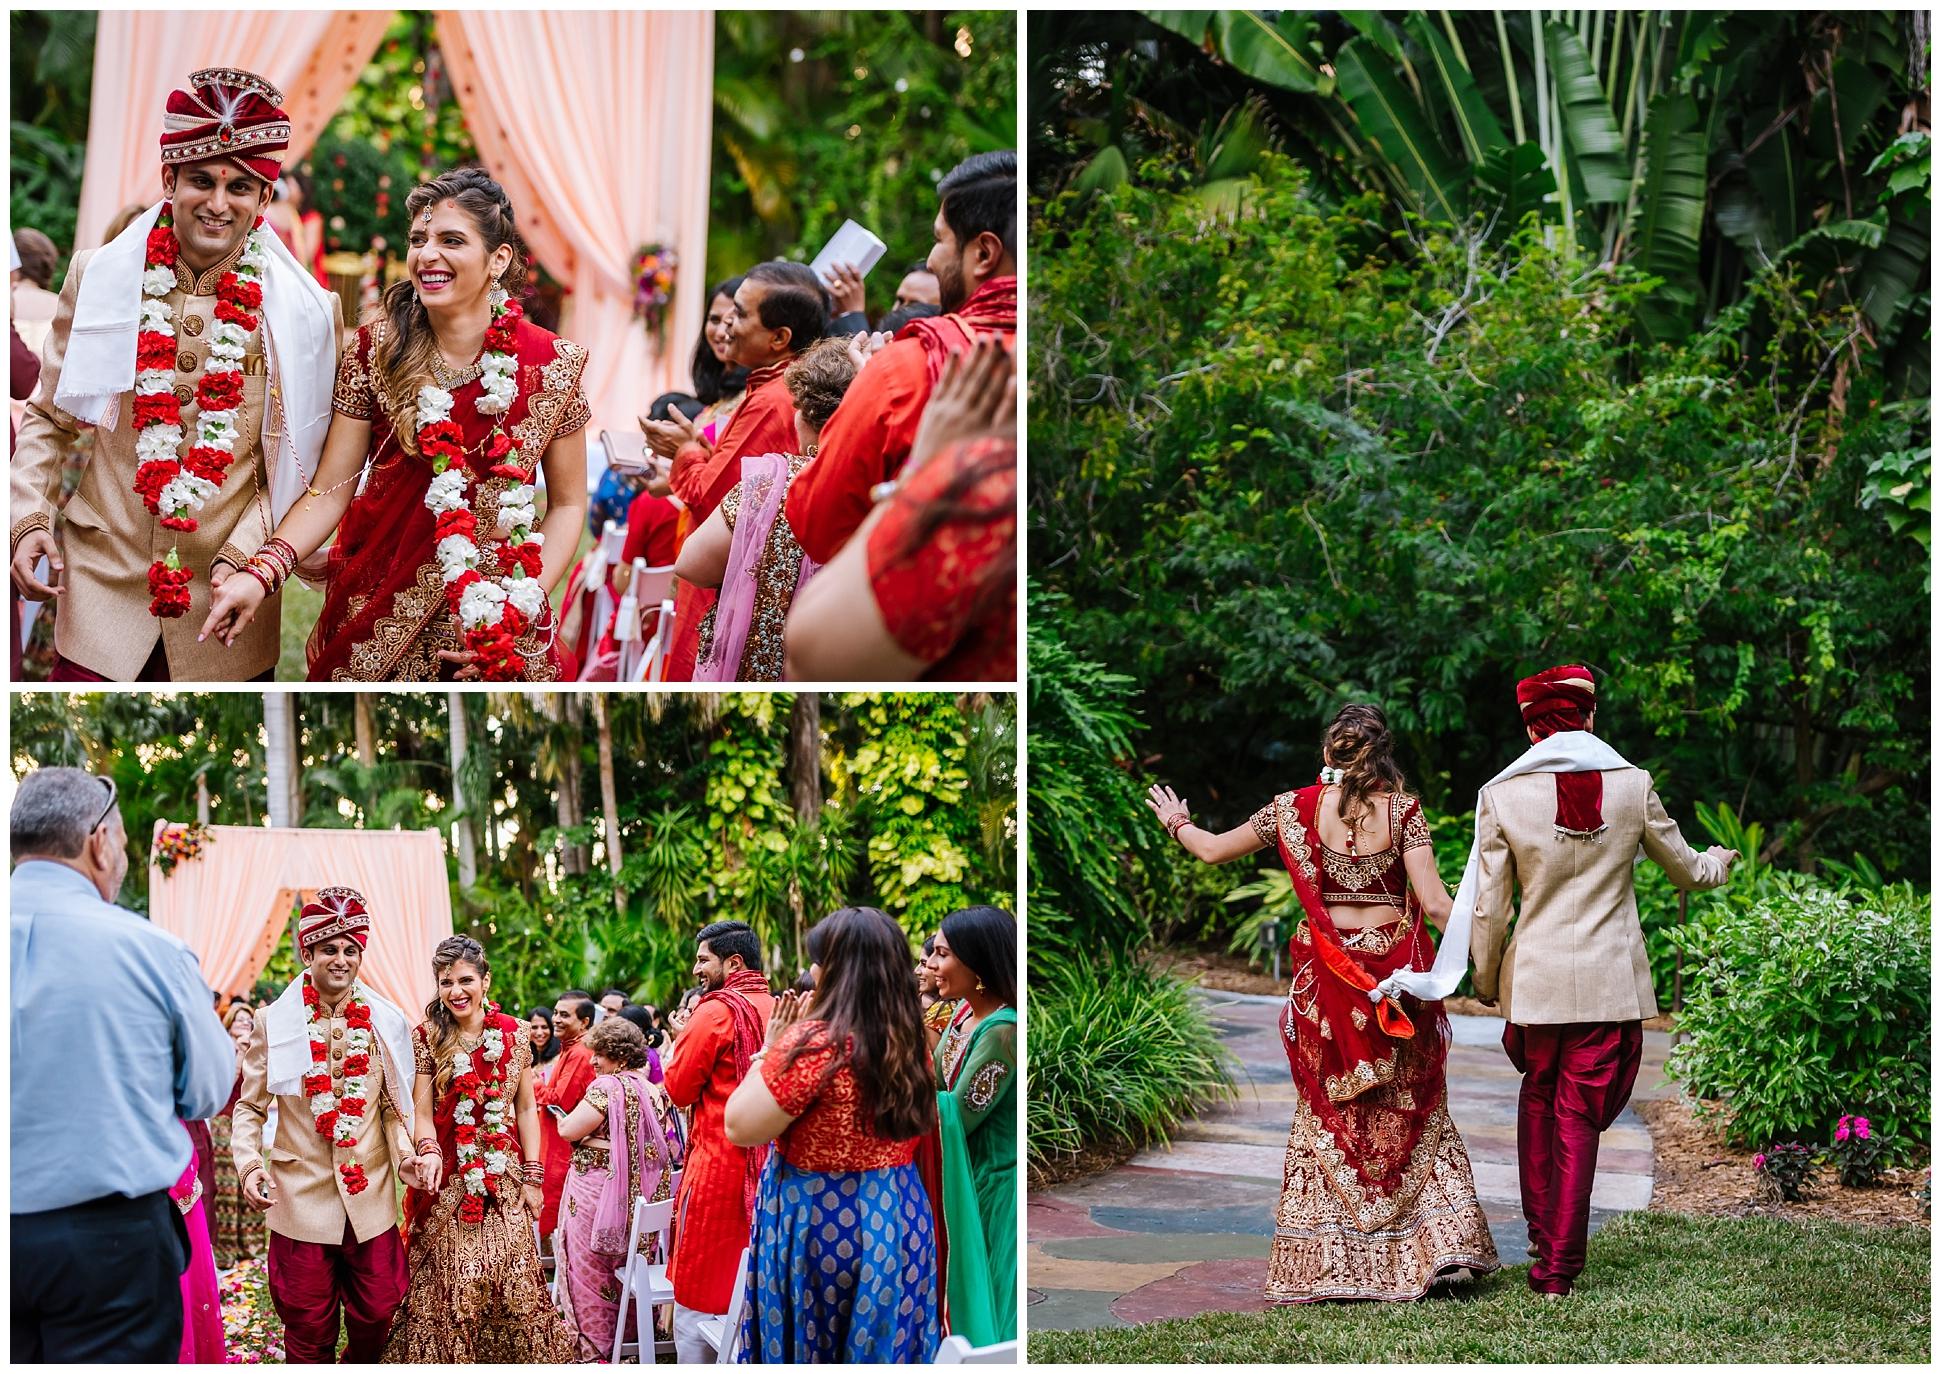 St-pete-indian-wedding-photographer-barat-sunken-gardens_0124.jpg